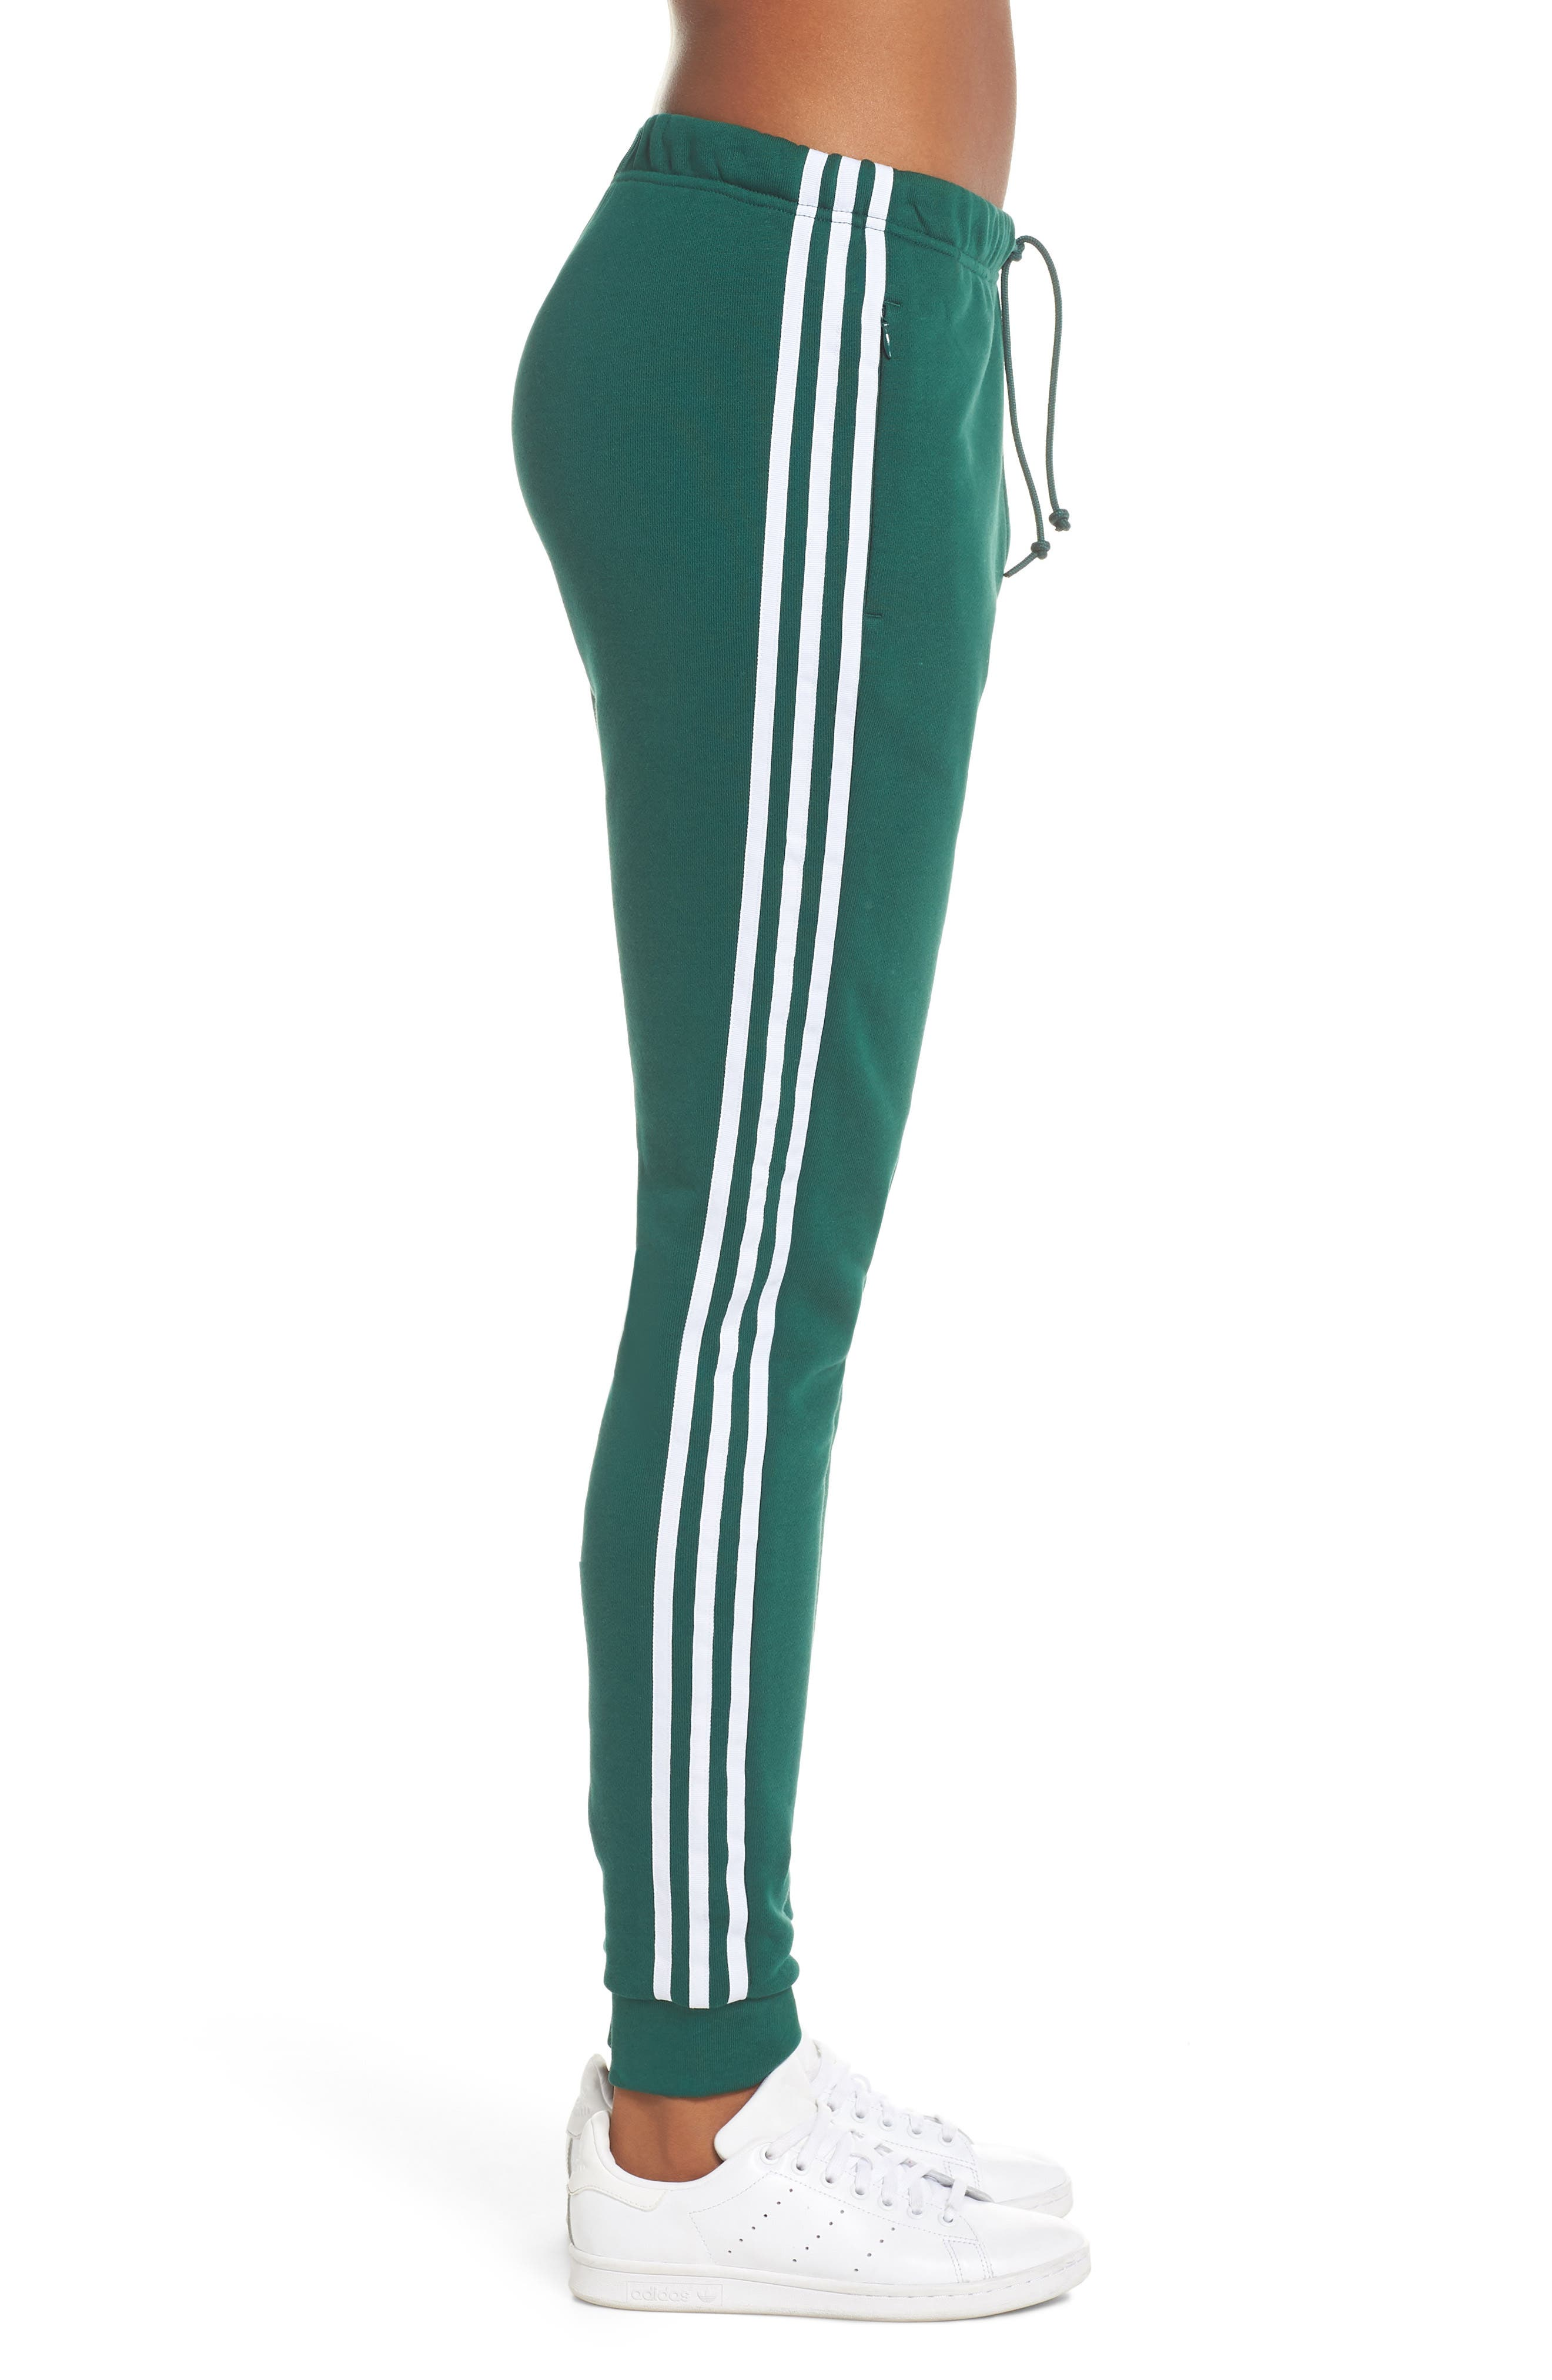 ADIDAS ORIGINALS, Cuffed Track Pants, Alternate thumbnail 4, color, 305